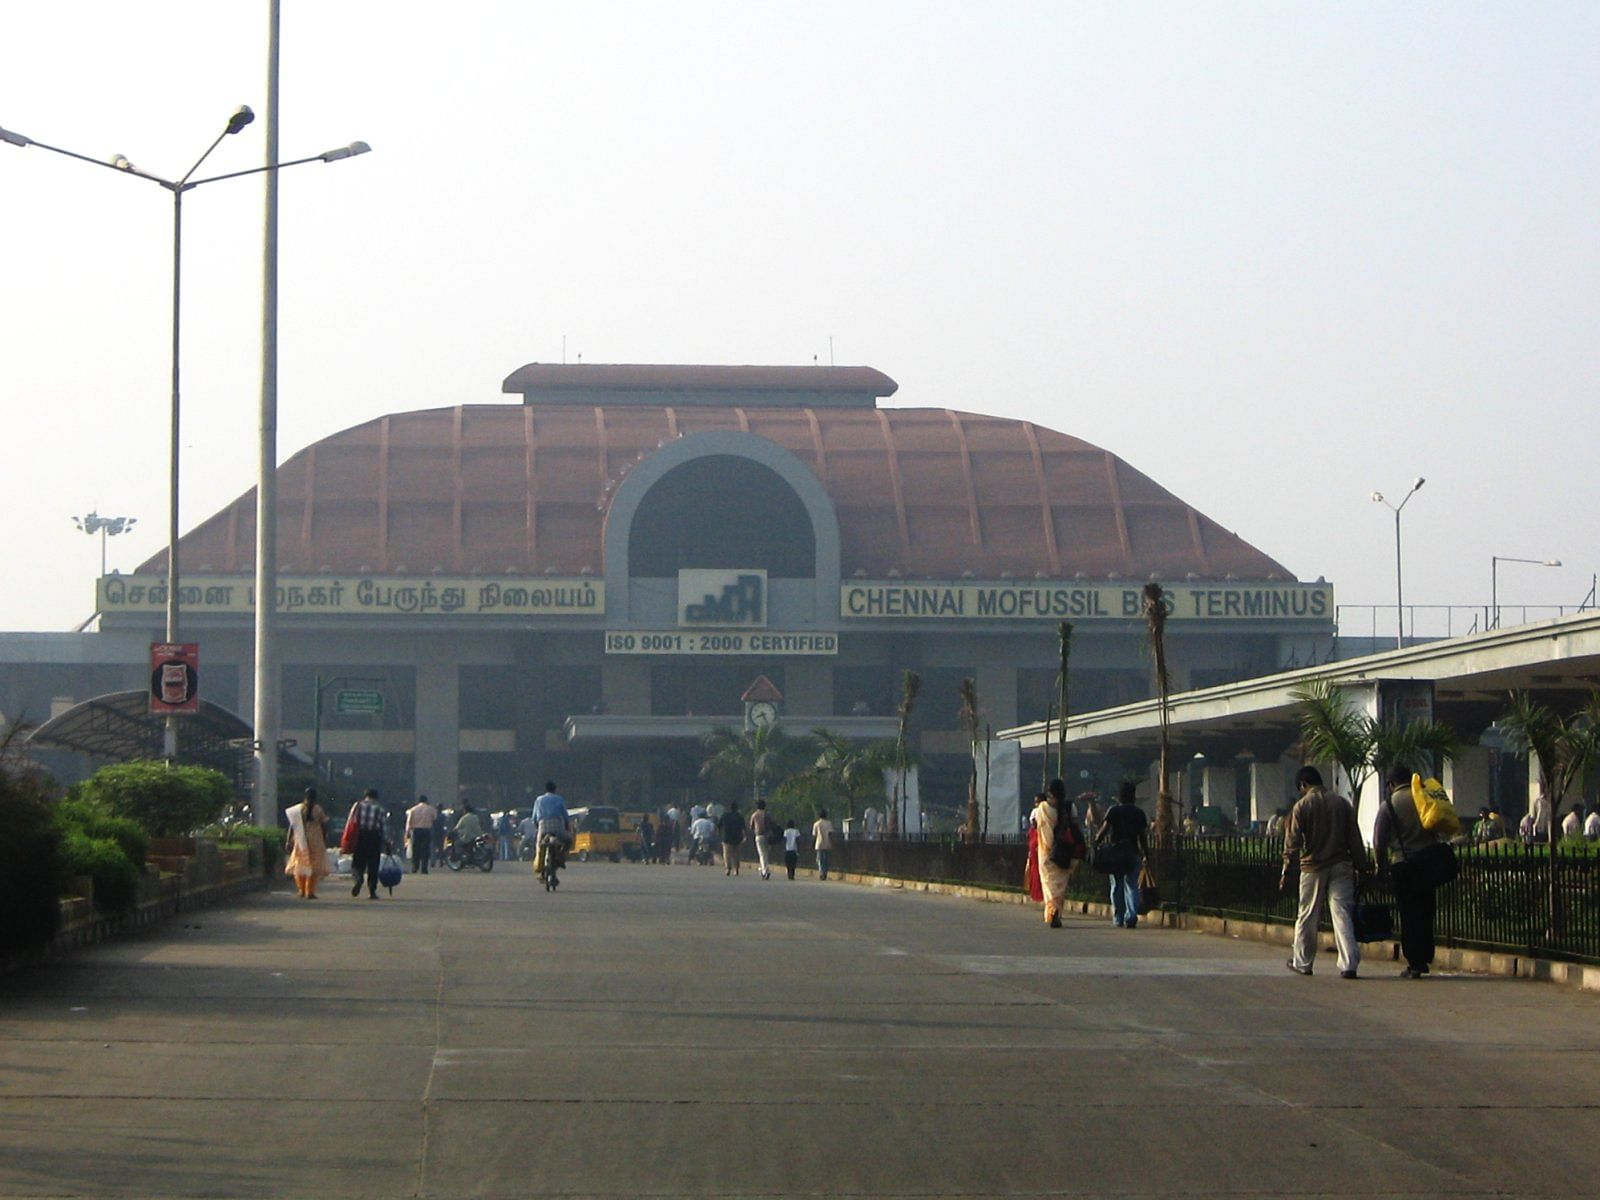 Photo courtesy: User:SriniG/Wikimedia